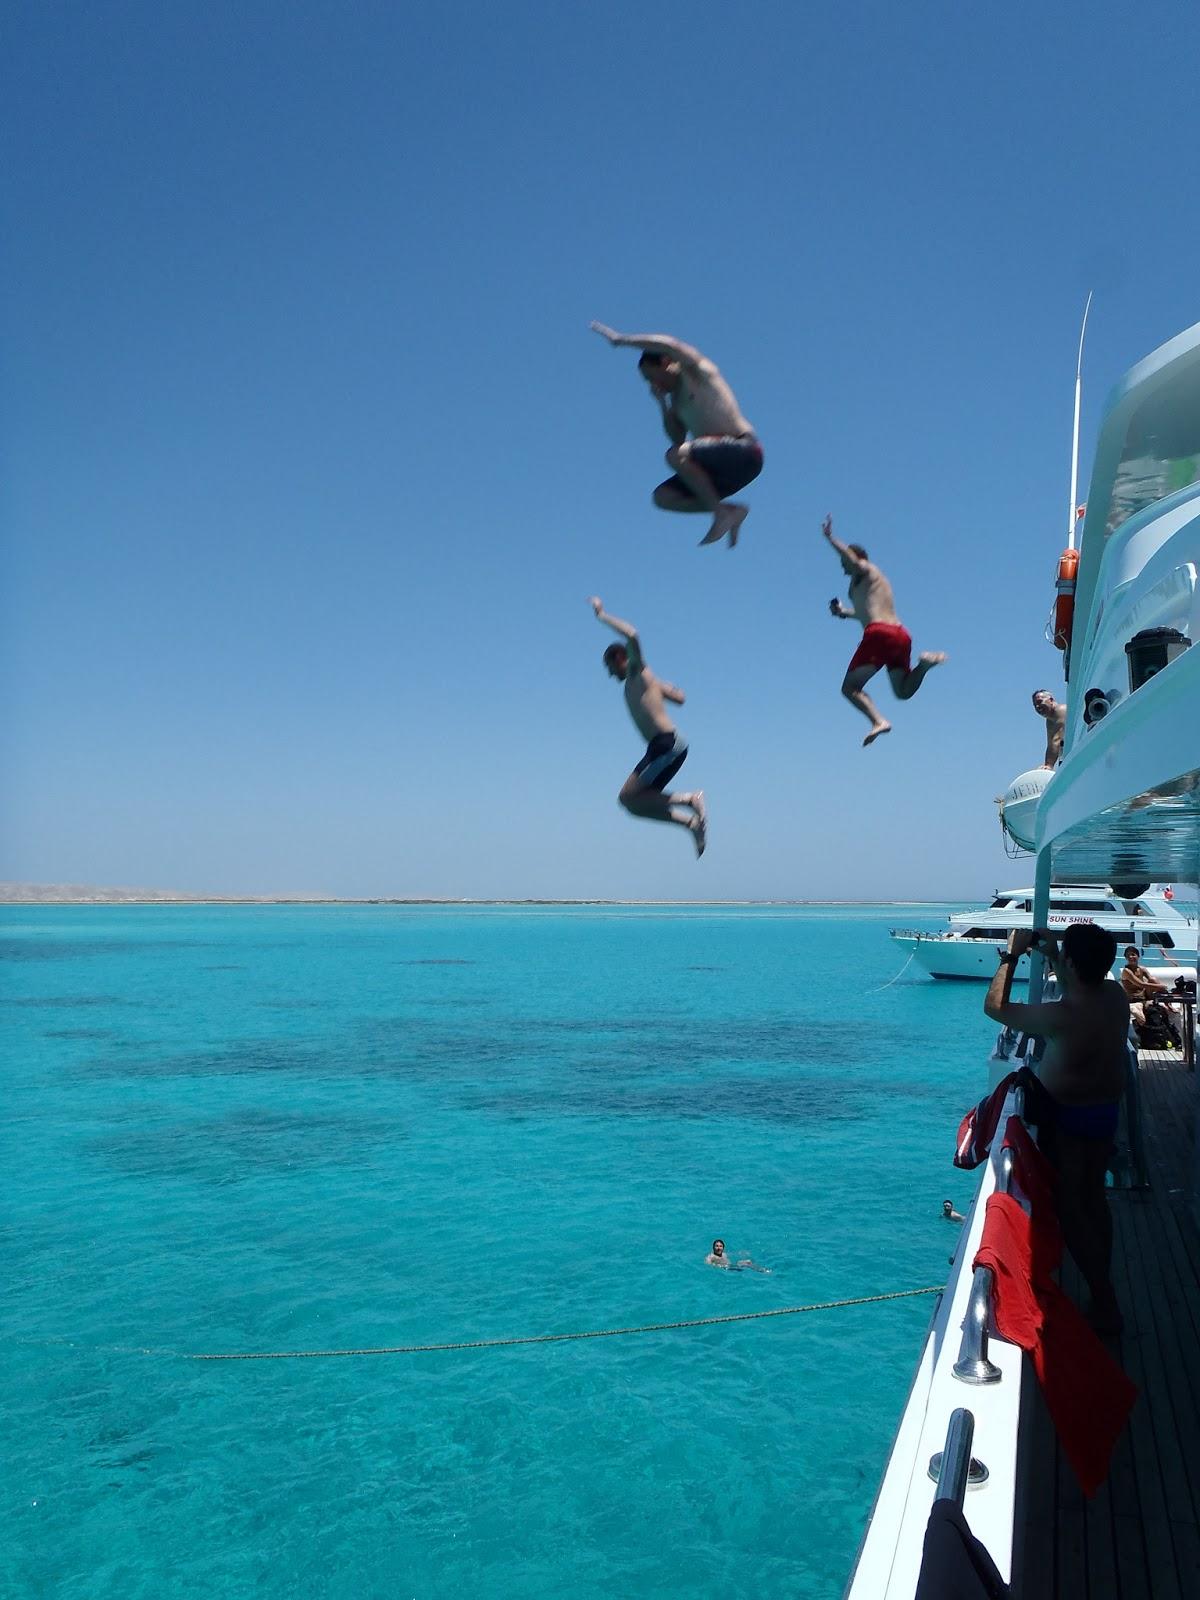 Mar Rojo Sur - Javier Girón, Jorge Girón y Adri